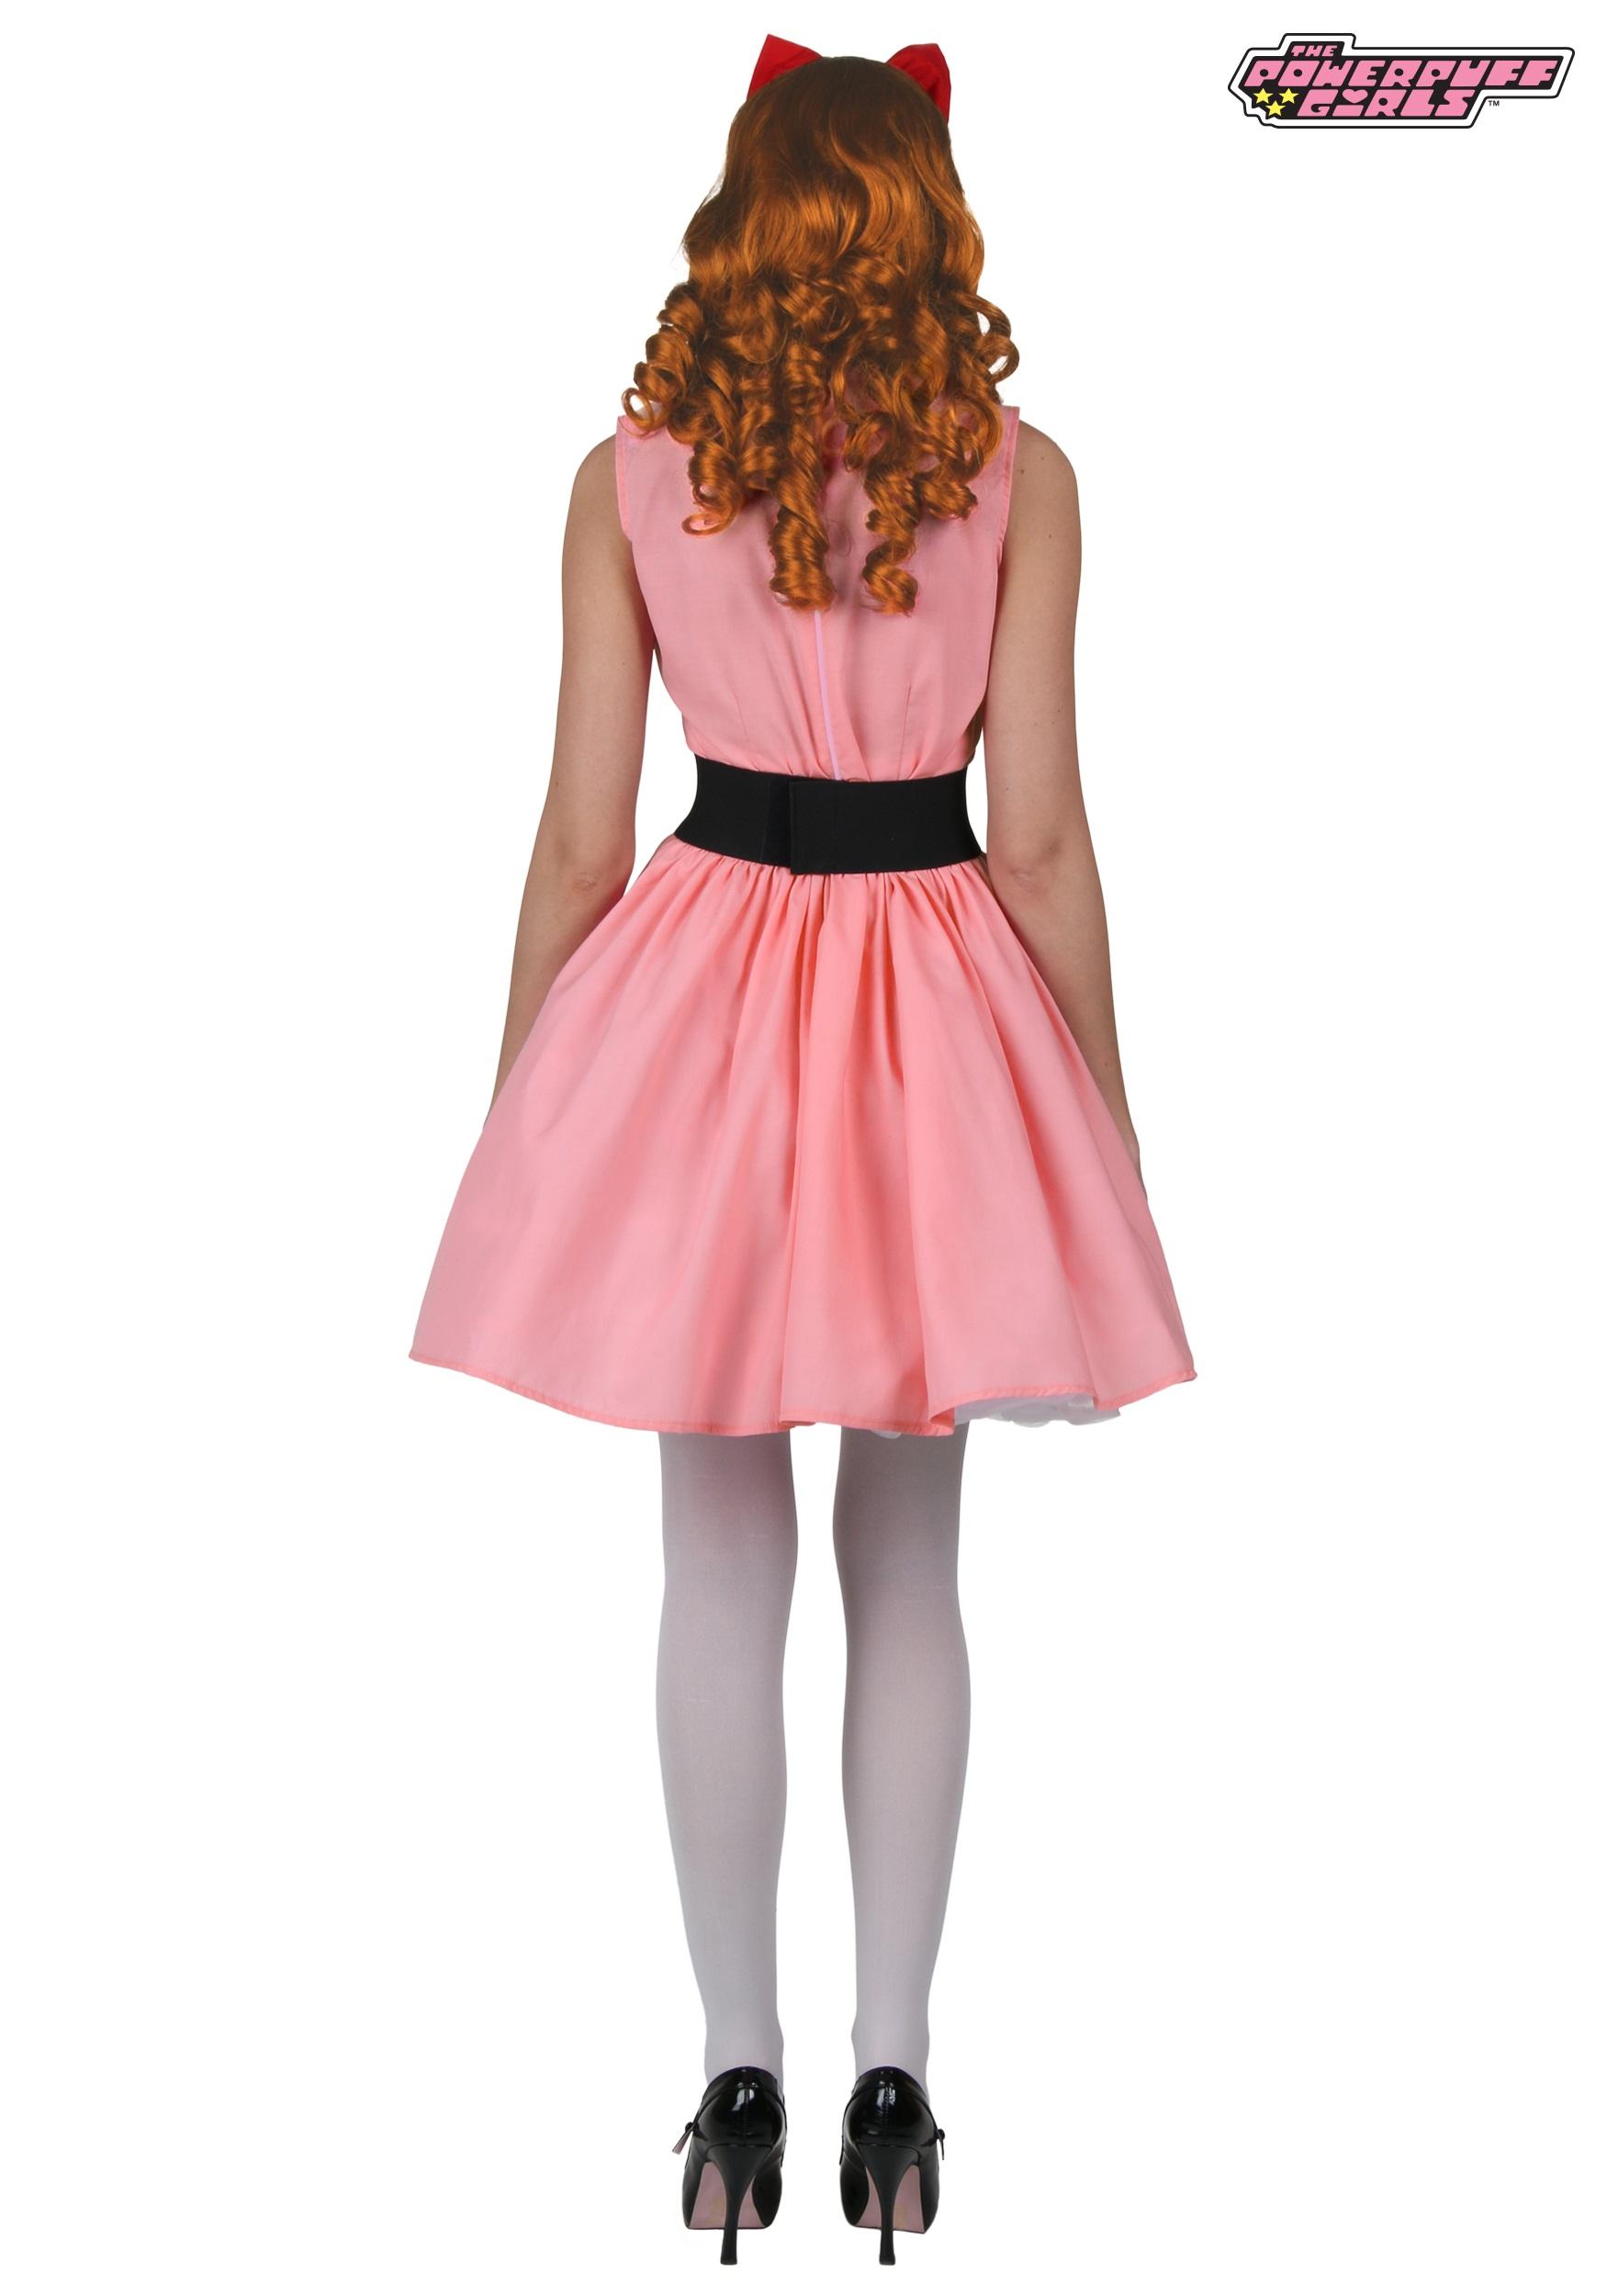 Baby Spice Halloween Costume